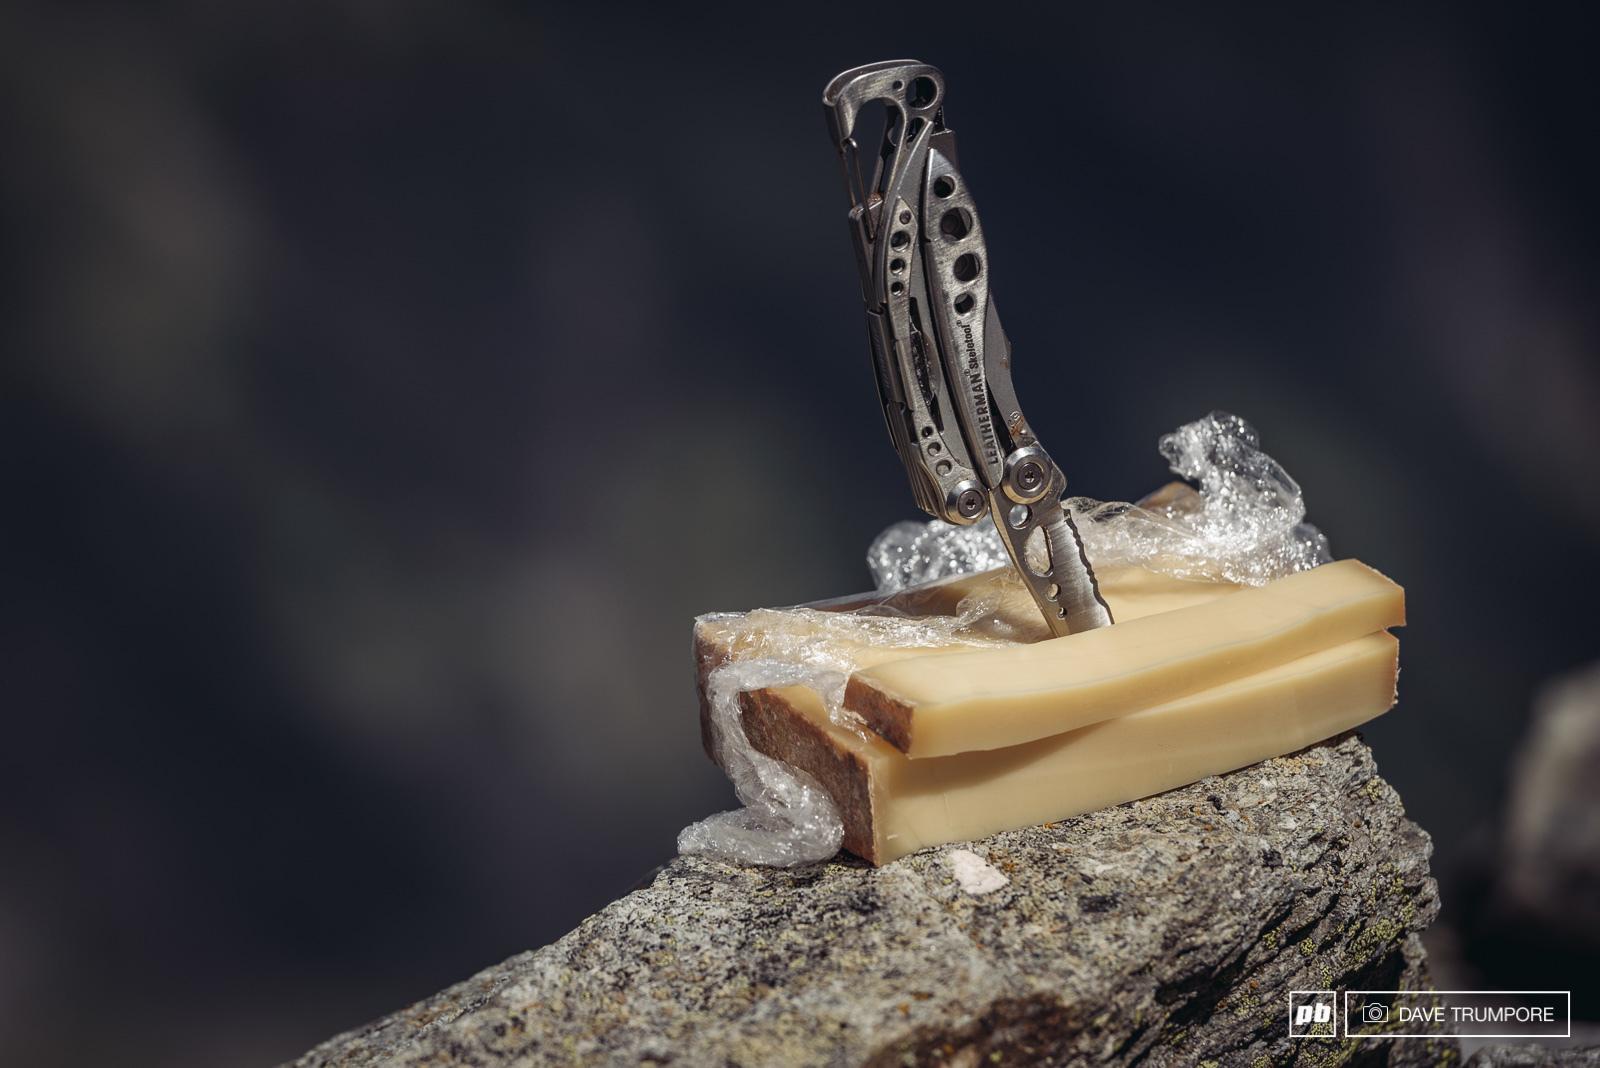 Swiss blades French cheese and Italian granite.